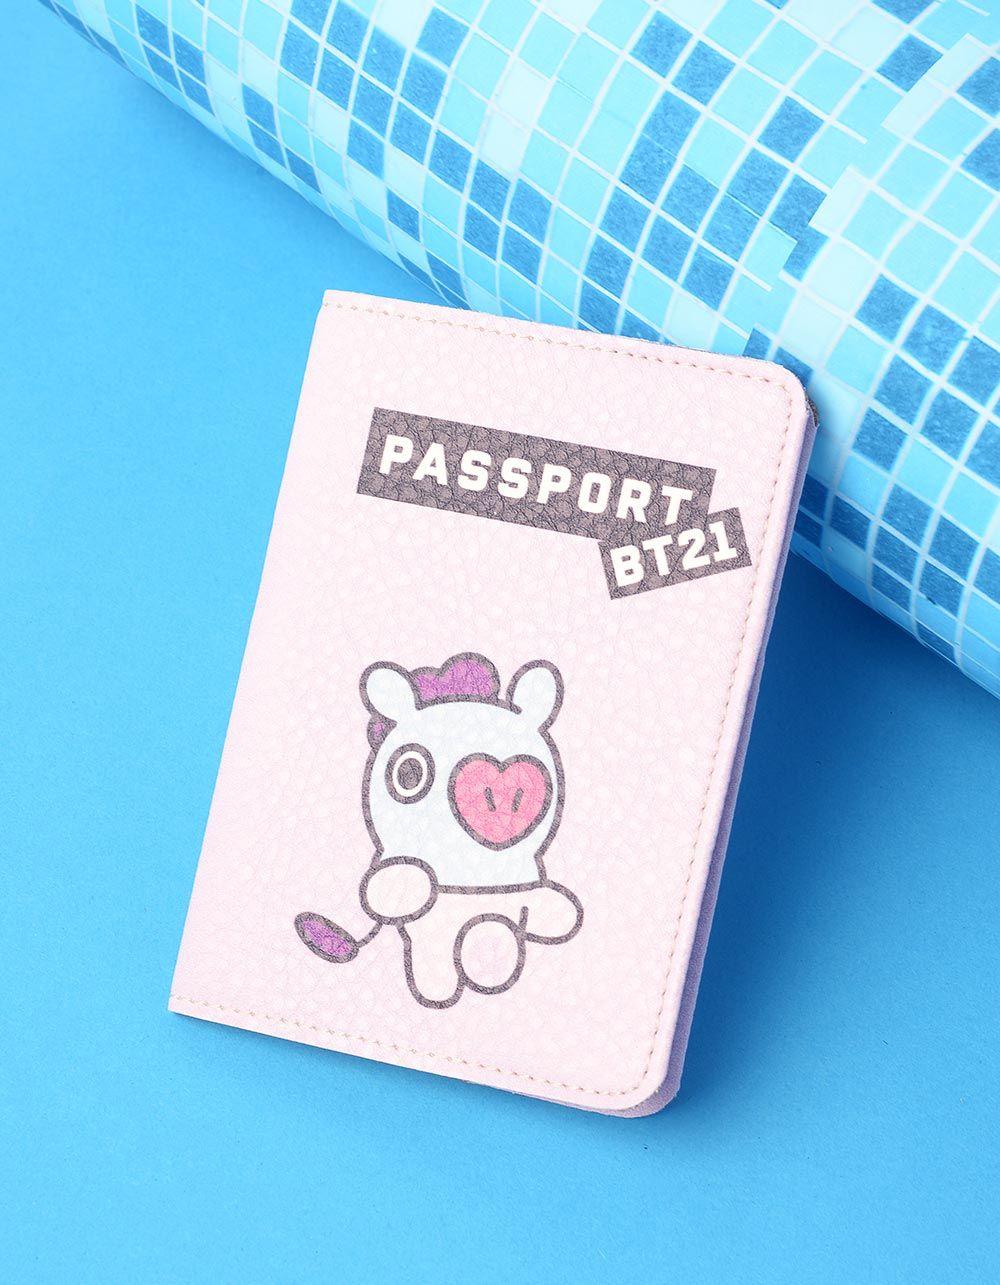 Обкладинка на паспорт з bts bt21 MANG  Хосок | 237250-35-XX